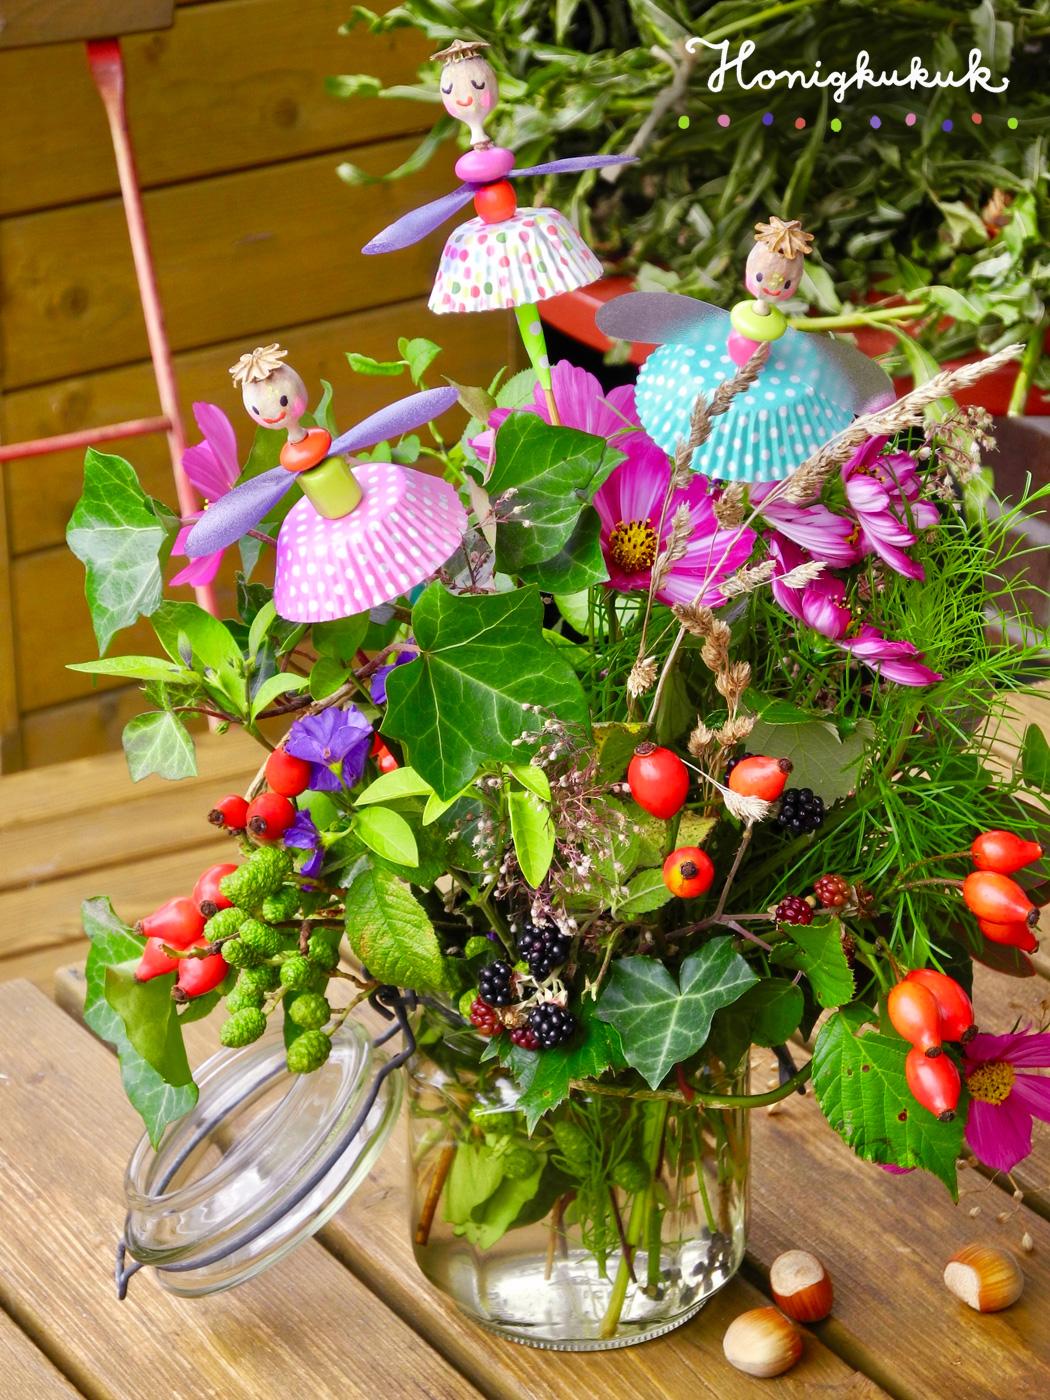 Feen aus Mohnkapseln im Blumenstrauß